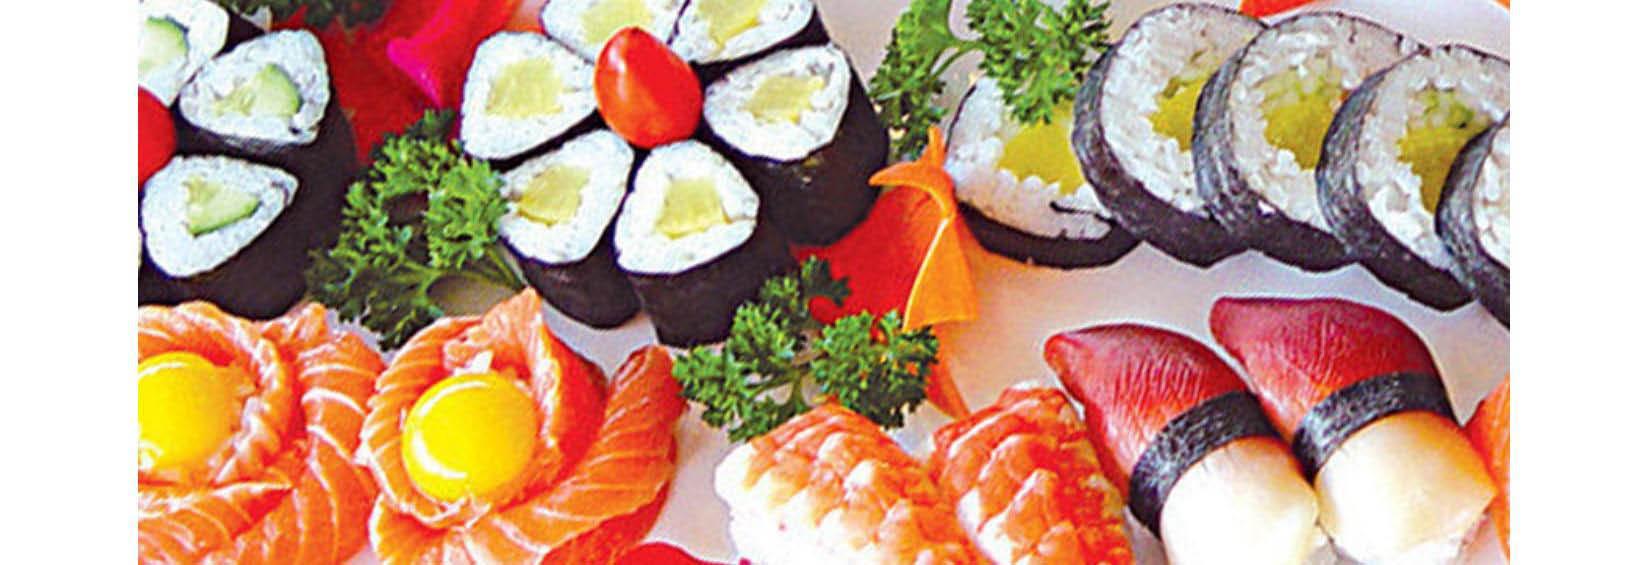 osaka-hibachi-sushi-bar-sachse-tx-banner